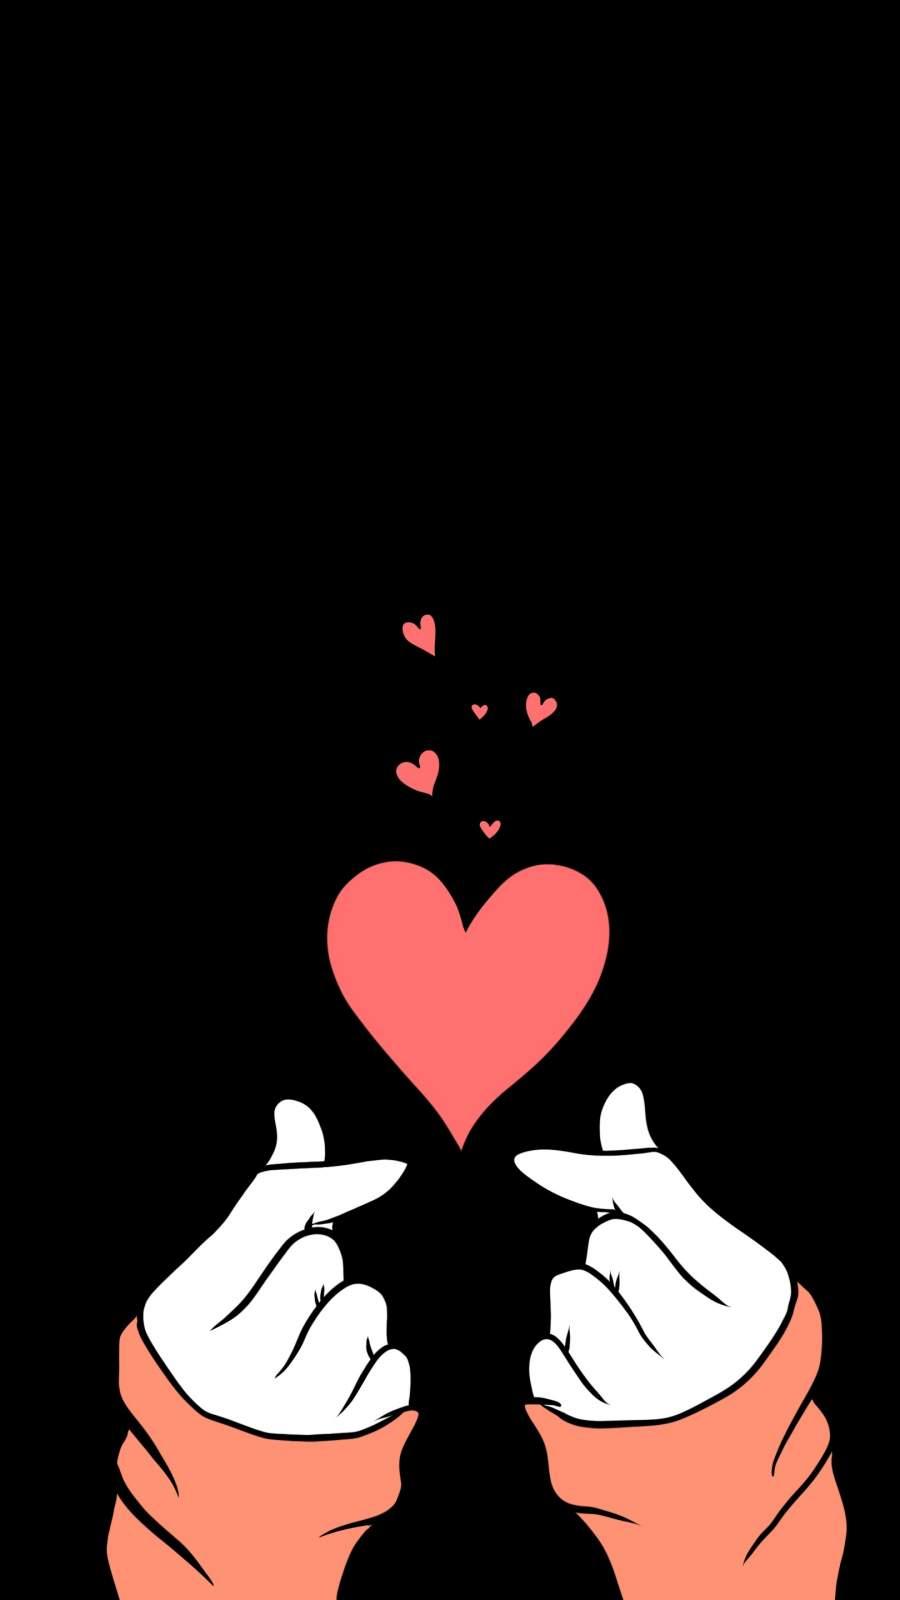 Love Heart iPhone Wallpaper